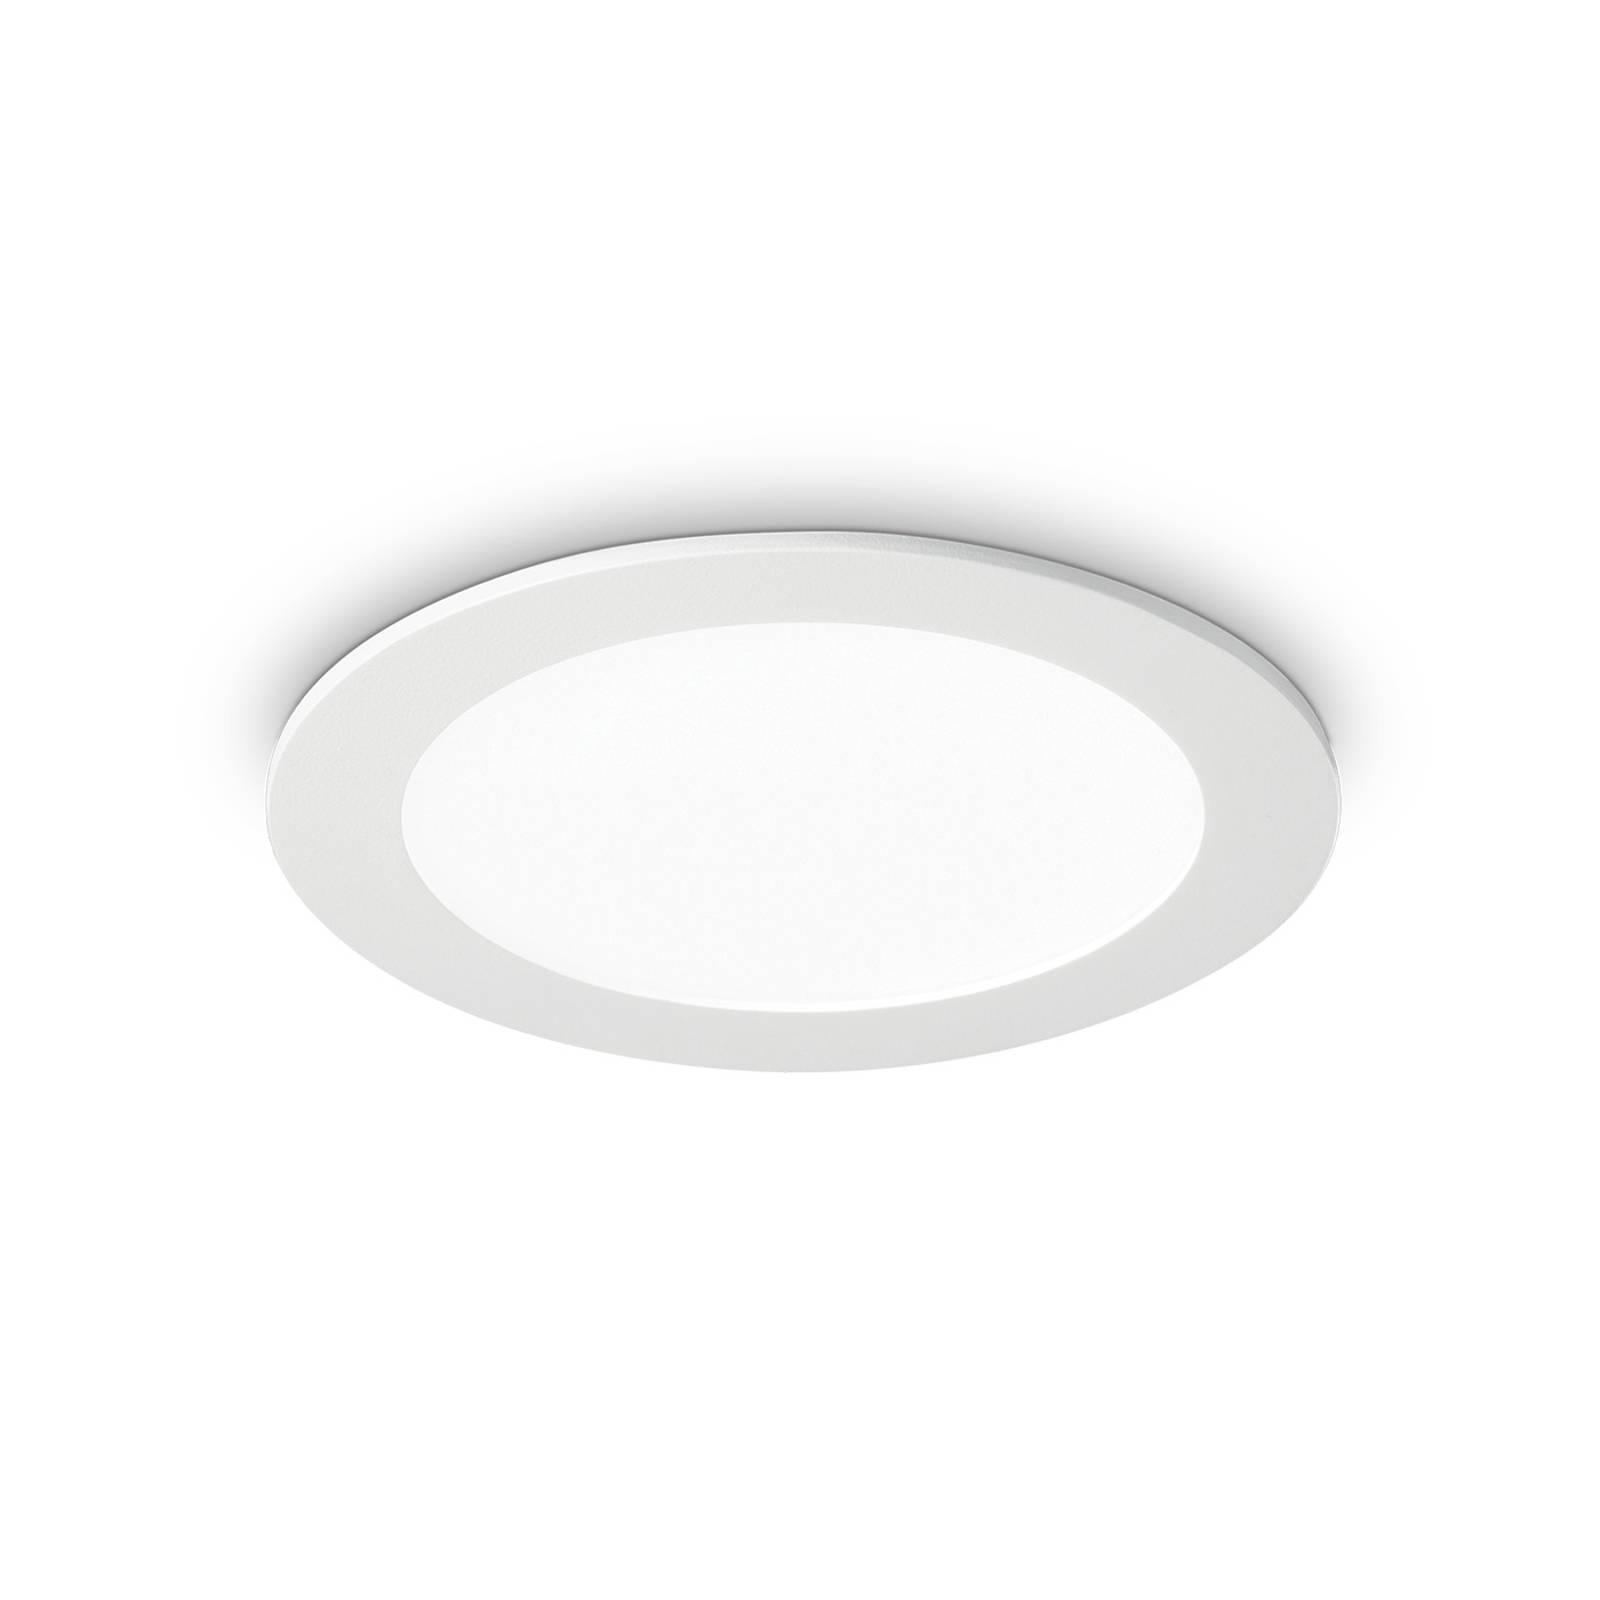 LED-kattouppovalaisin Groove round 3 000 K, 11,8cm